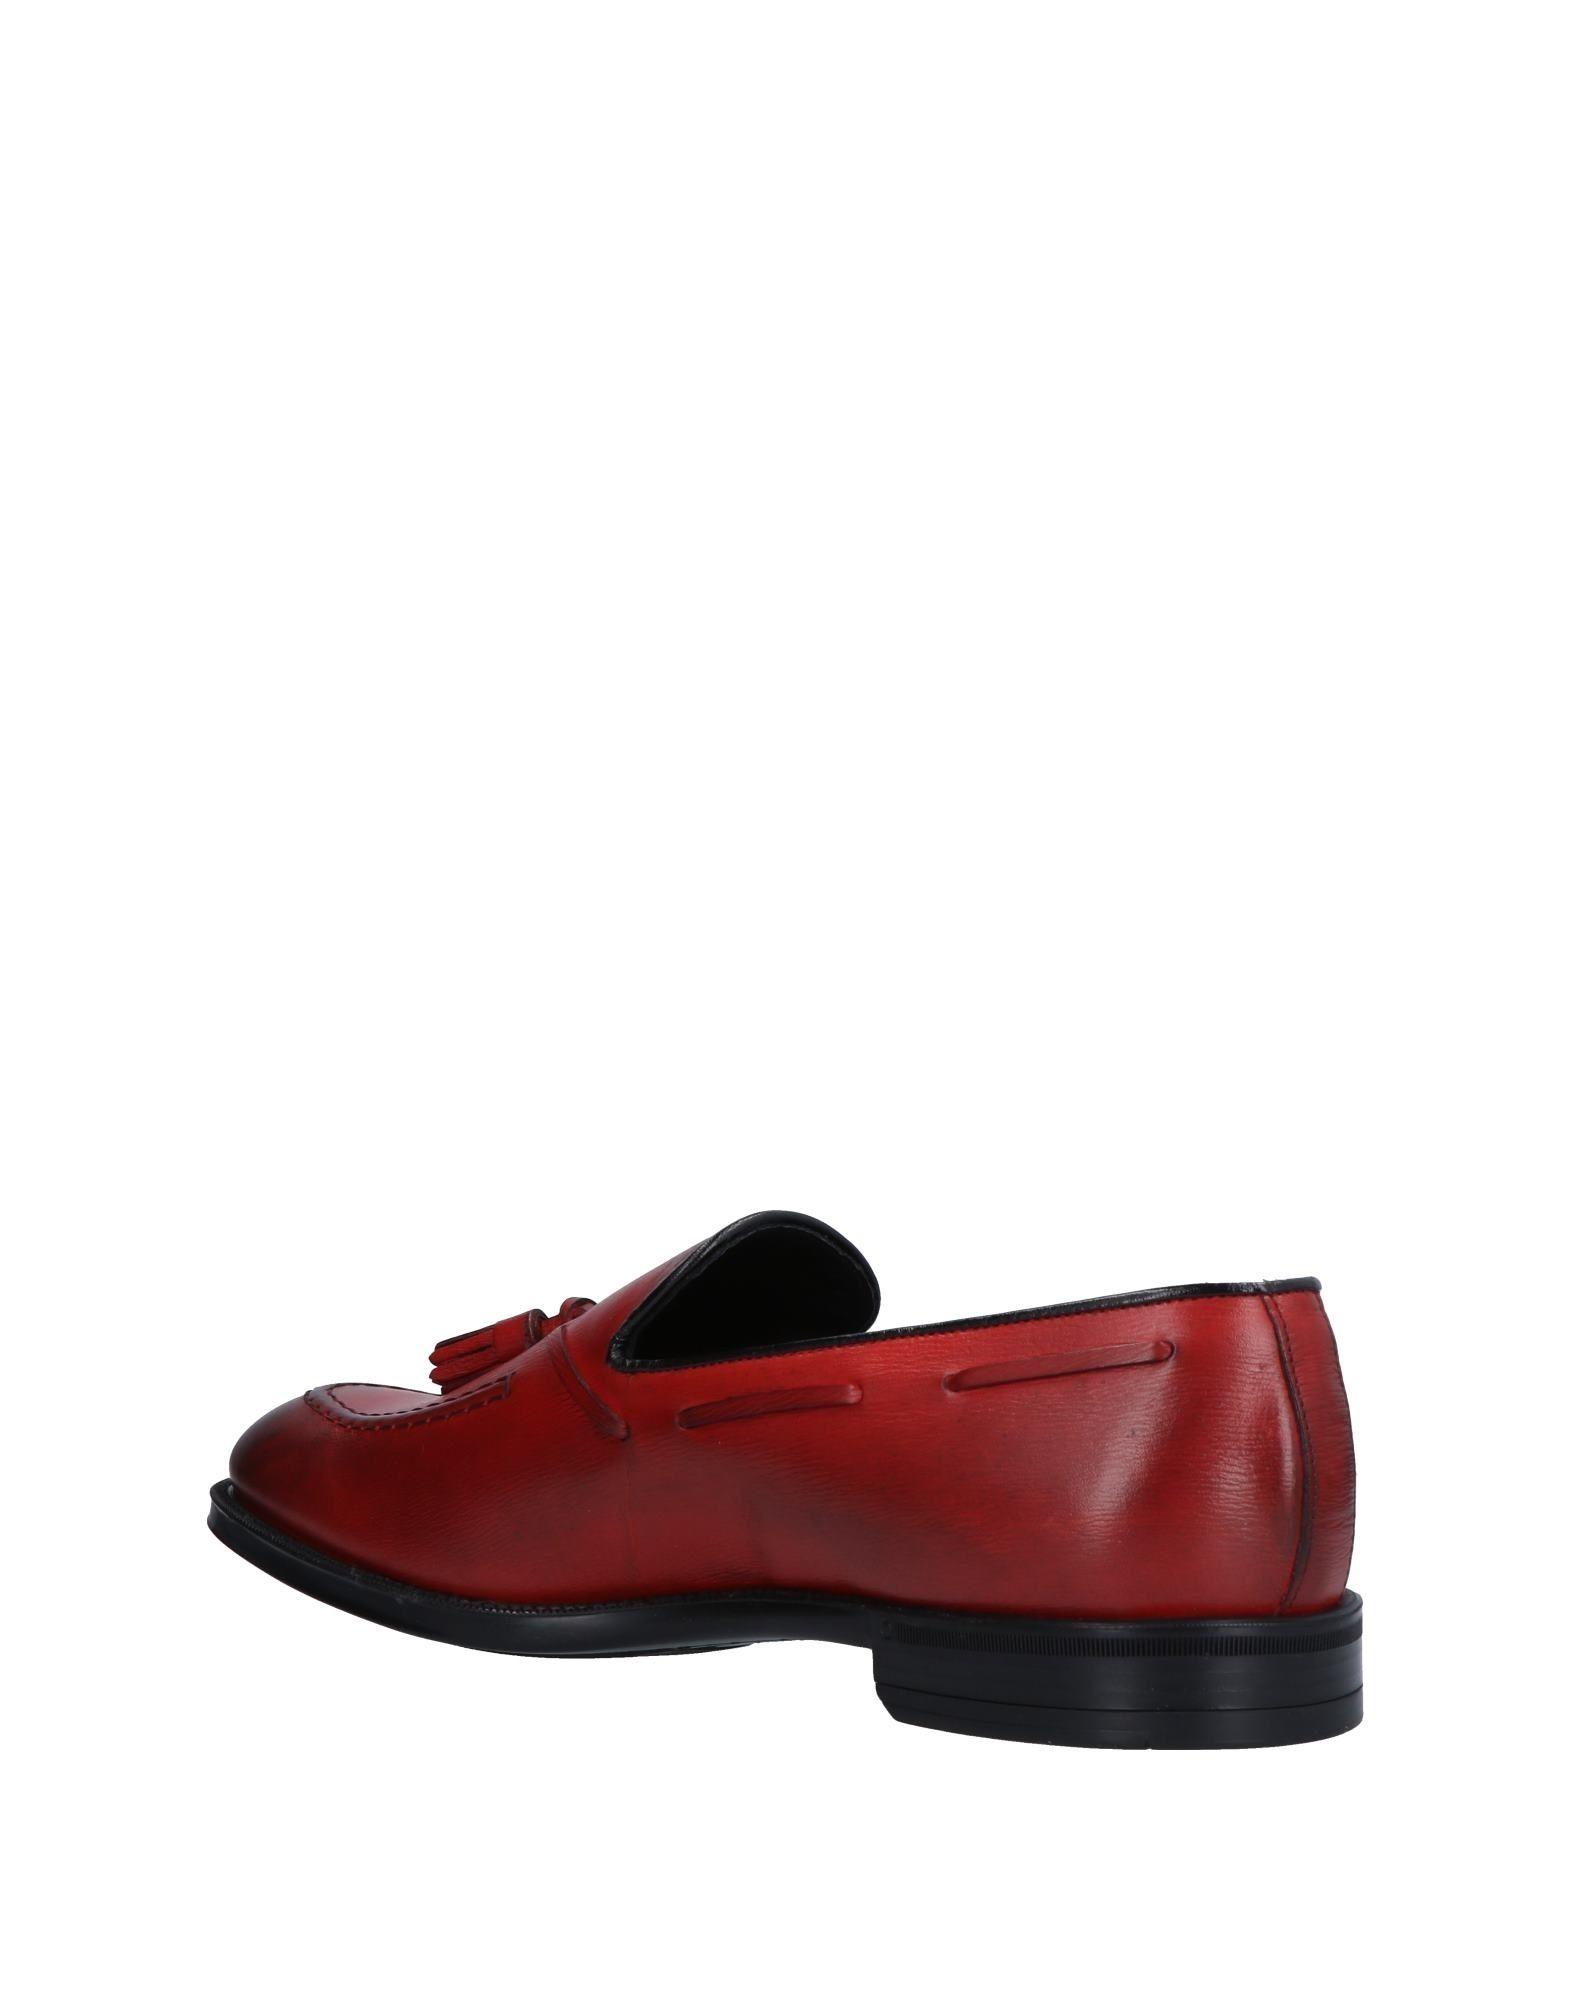 Doucal's Gute Mokassins Herren  11502126RO Gute Doucal's Qualität beliebte Schuhe 1fe1f3